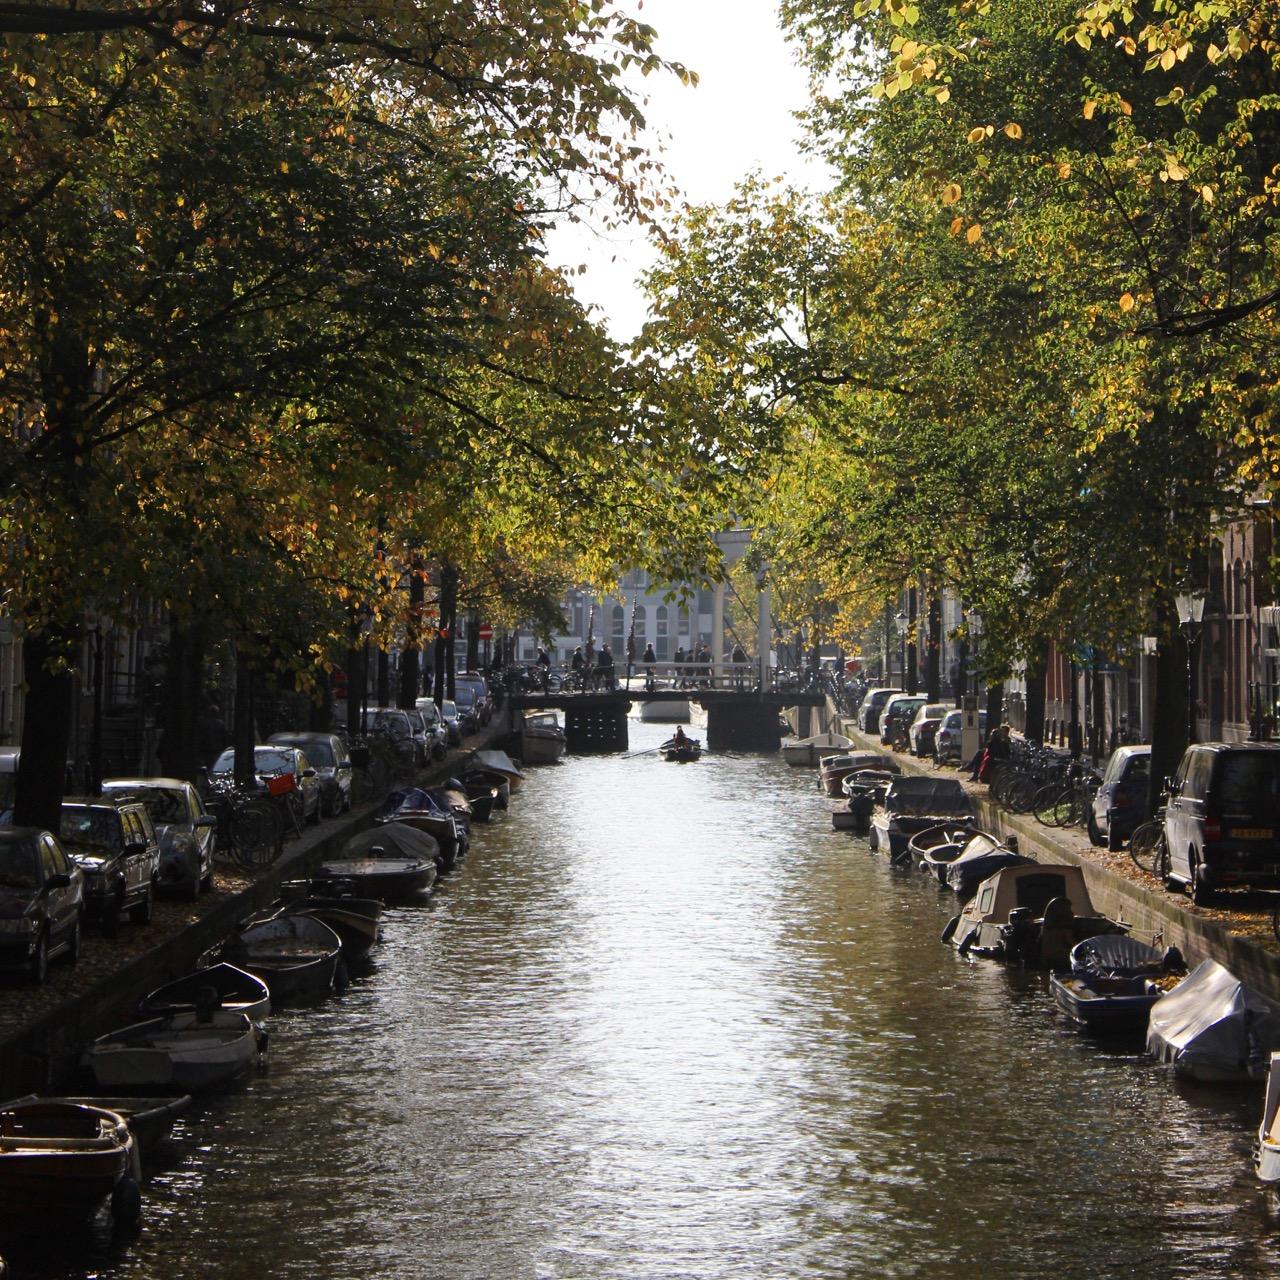 Amsterdam, Netherlands - 11